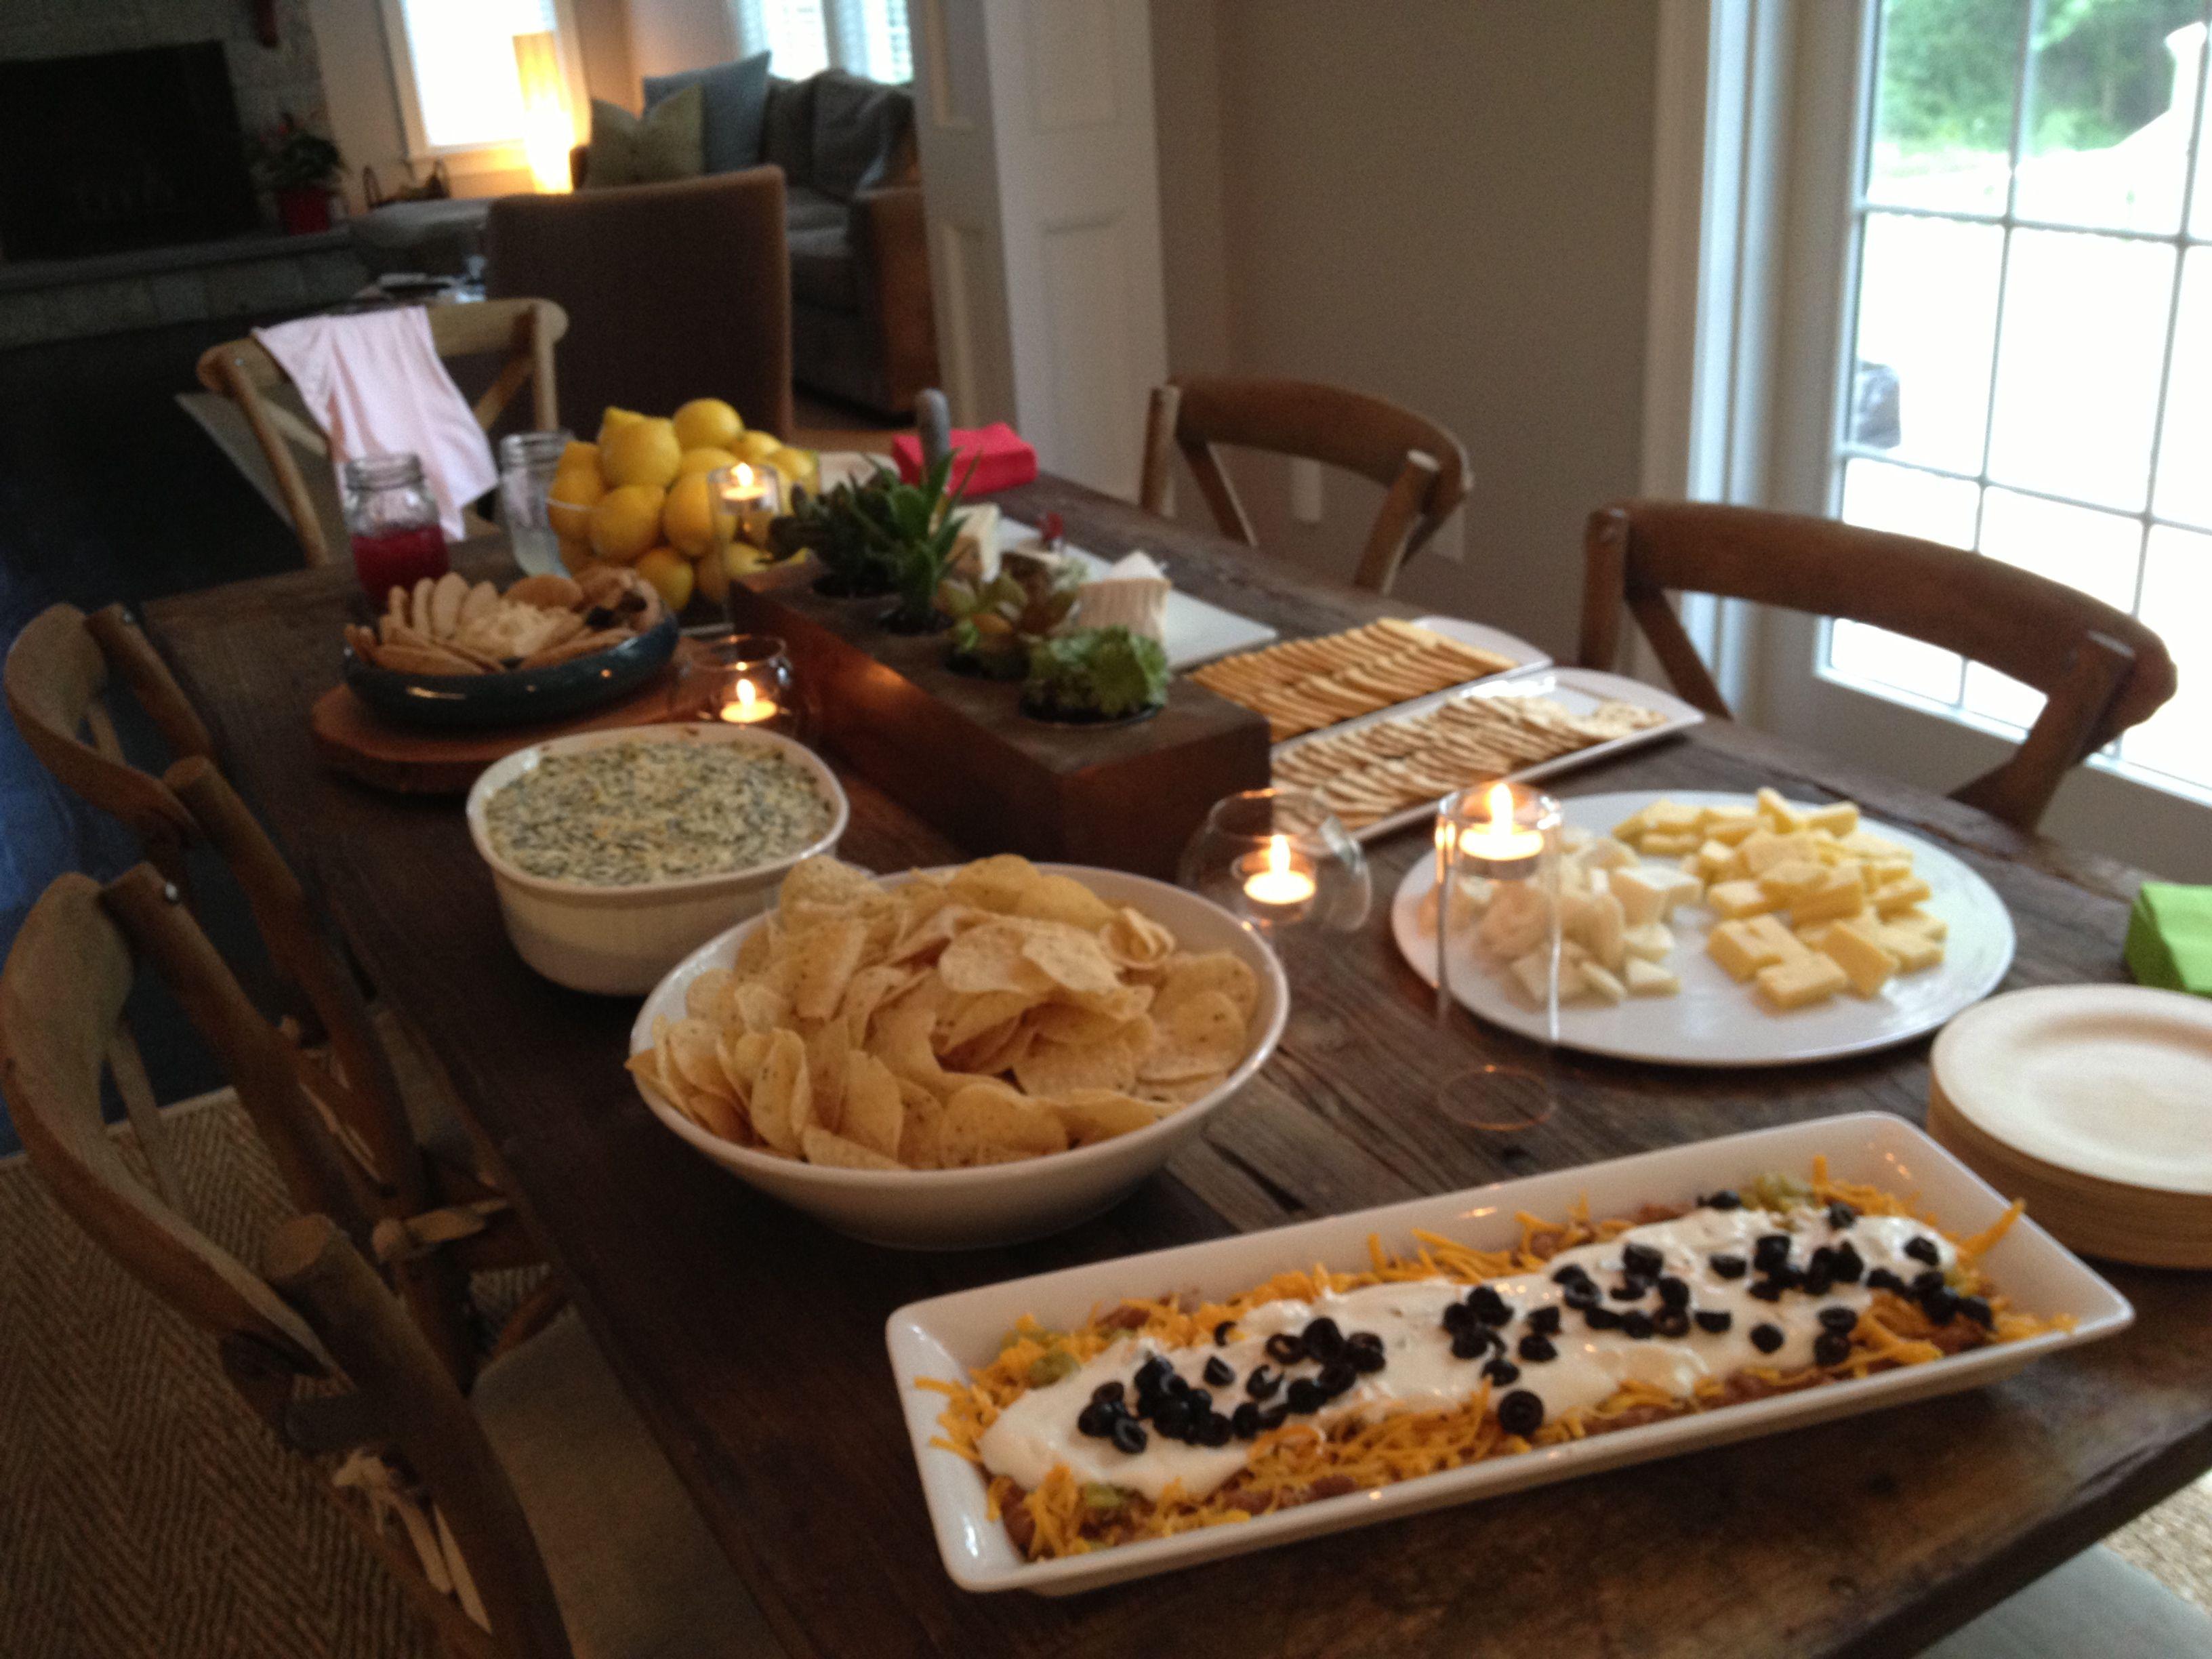 My Dirty Aprons Housewarming Party - Housewarming - Pinterest -